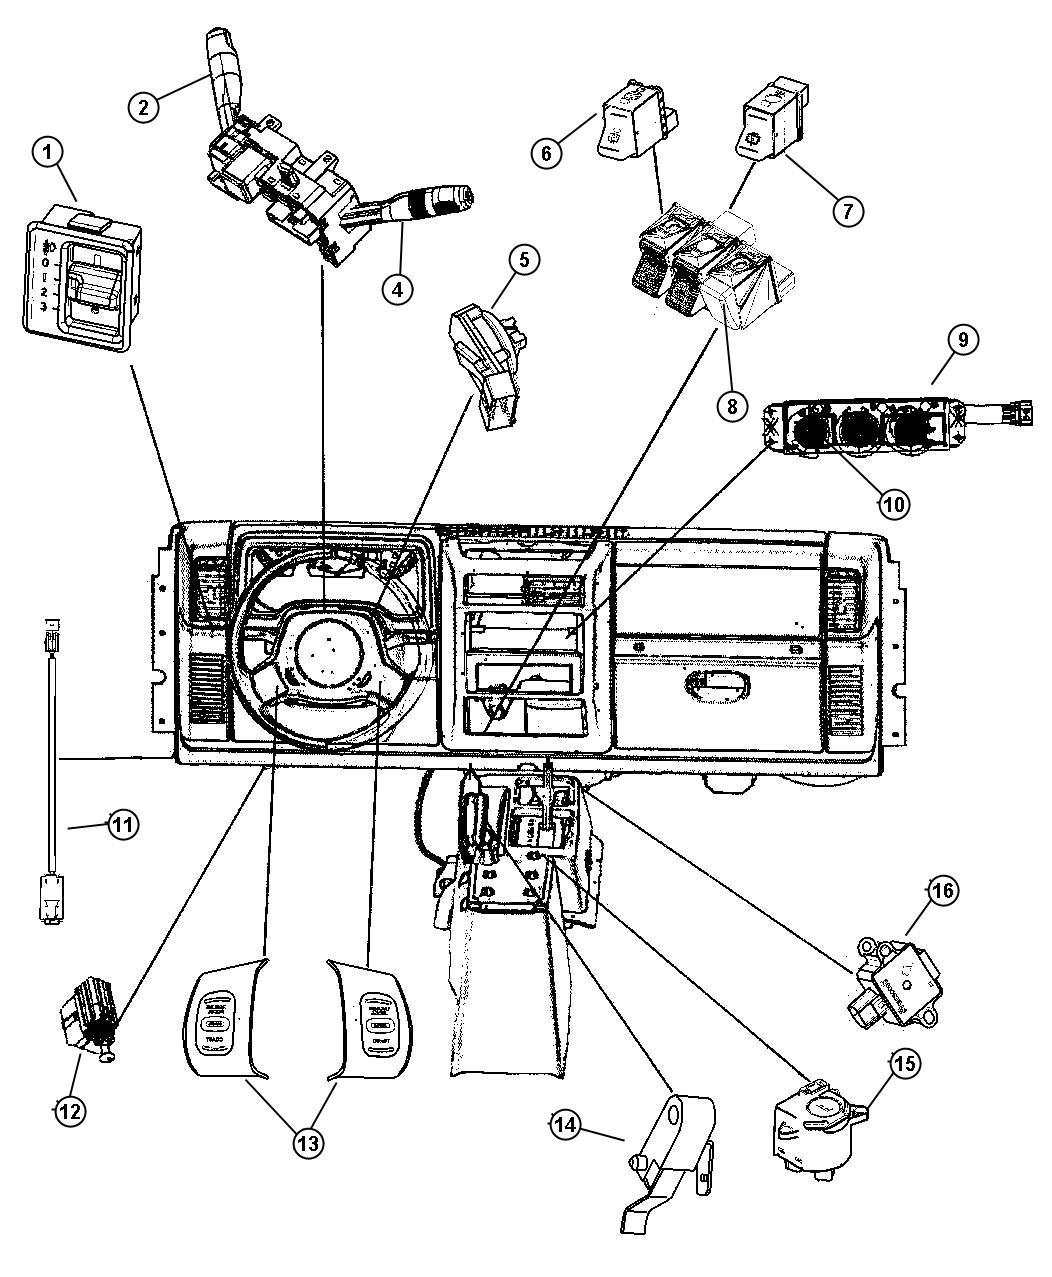 Jeep Wrangler Switch Passenger Airbag Disarm Air